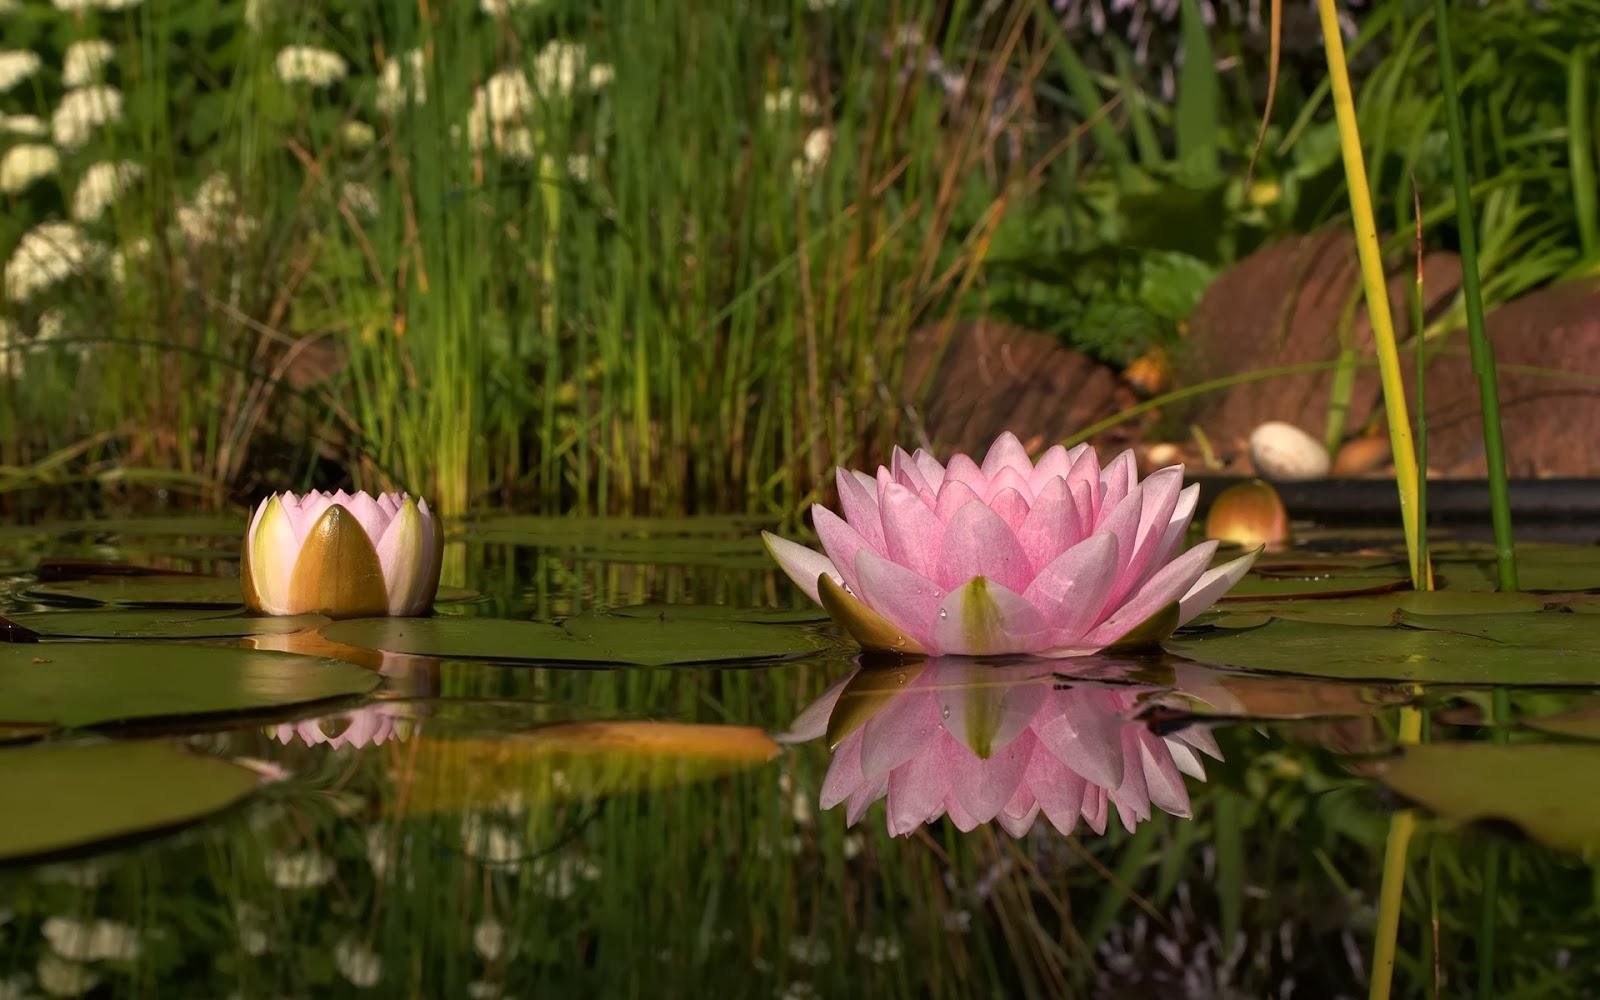 Carpe diem haiku kai carpe diem theme week 3 magnolia blossoms wednesday april 20 2016 izmirmasajfo Choice Image